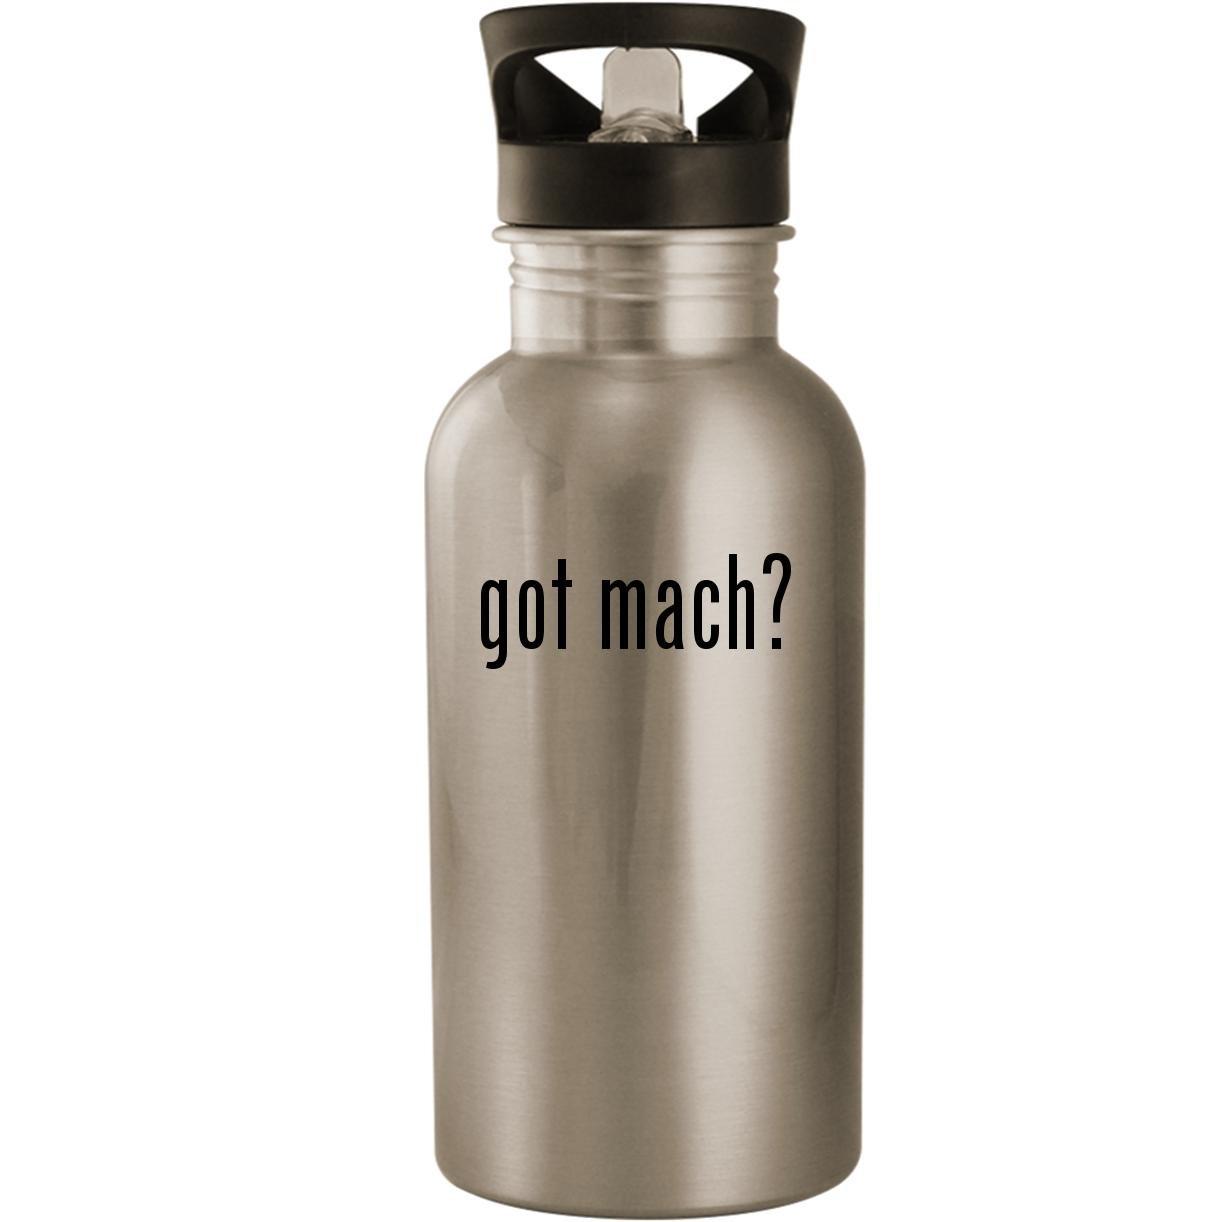 got mach? - Stainless Steel 20oz Road Ready Water Bottle, Silver